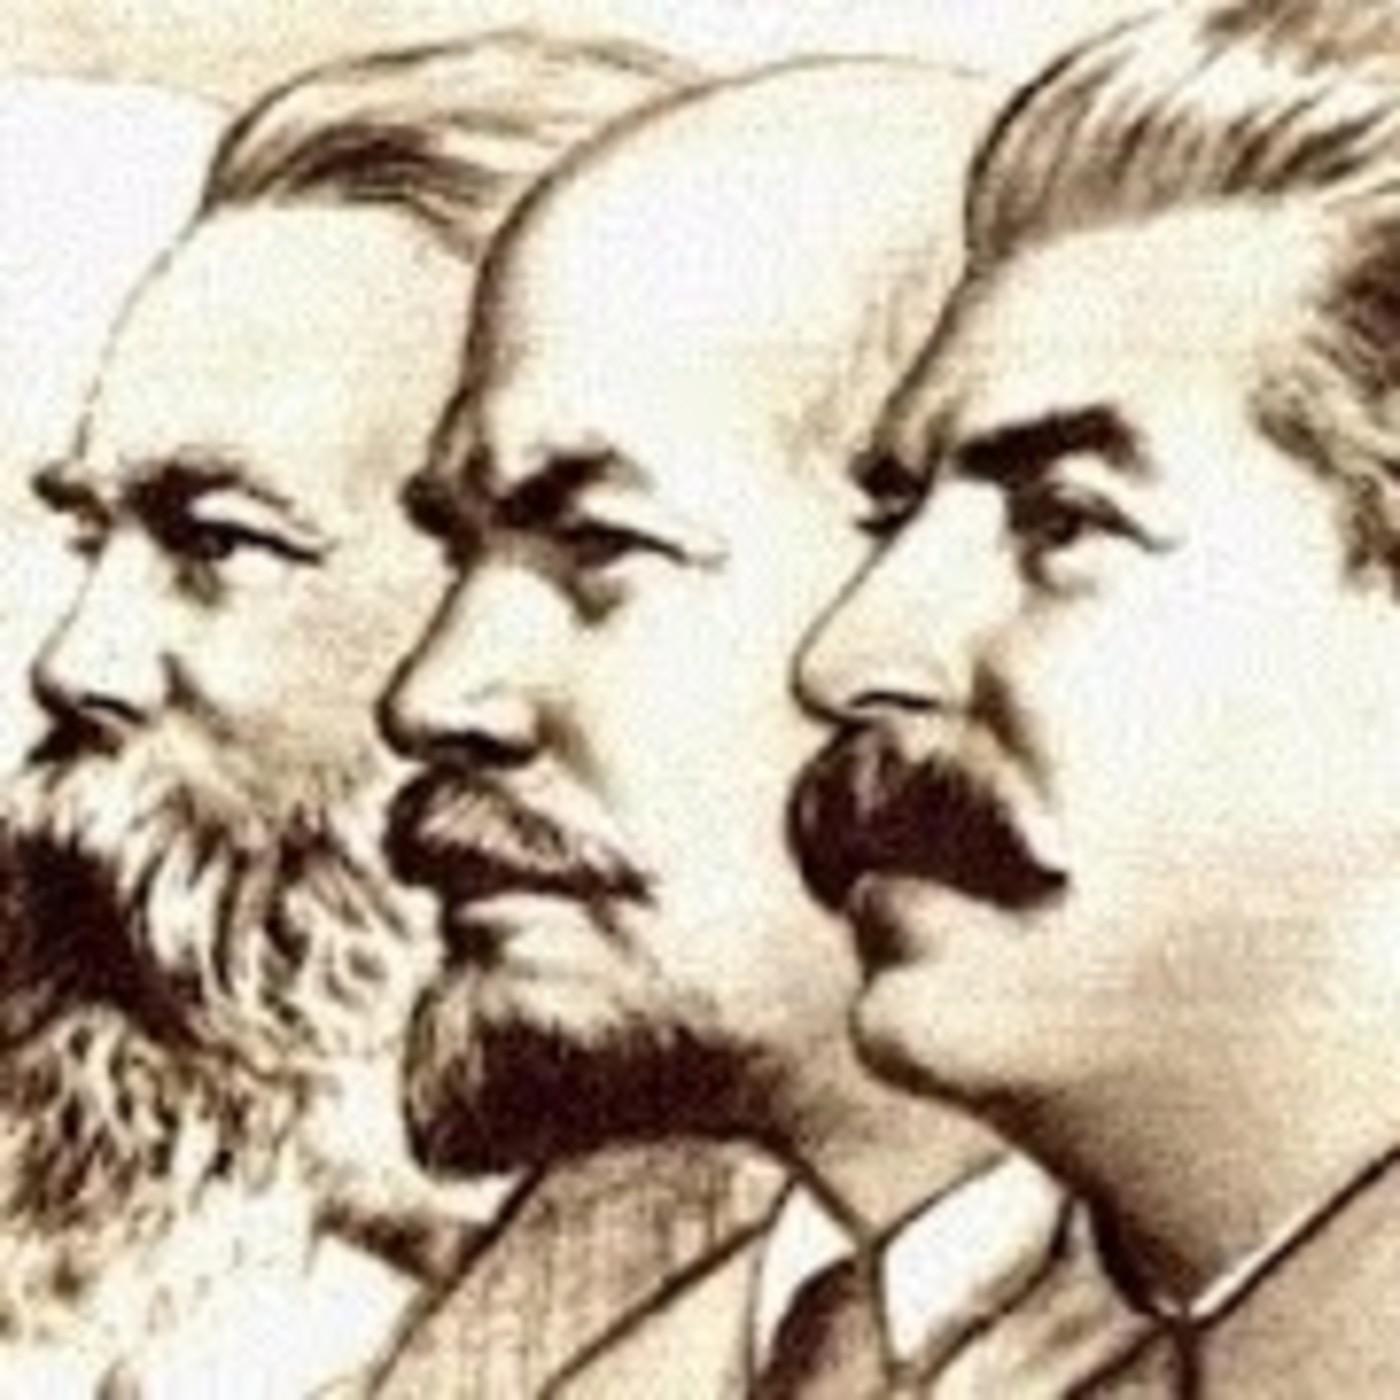 comunismo historia de una ilusion online dating